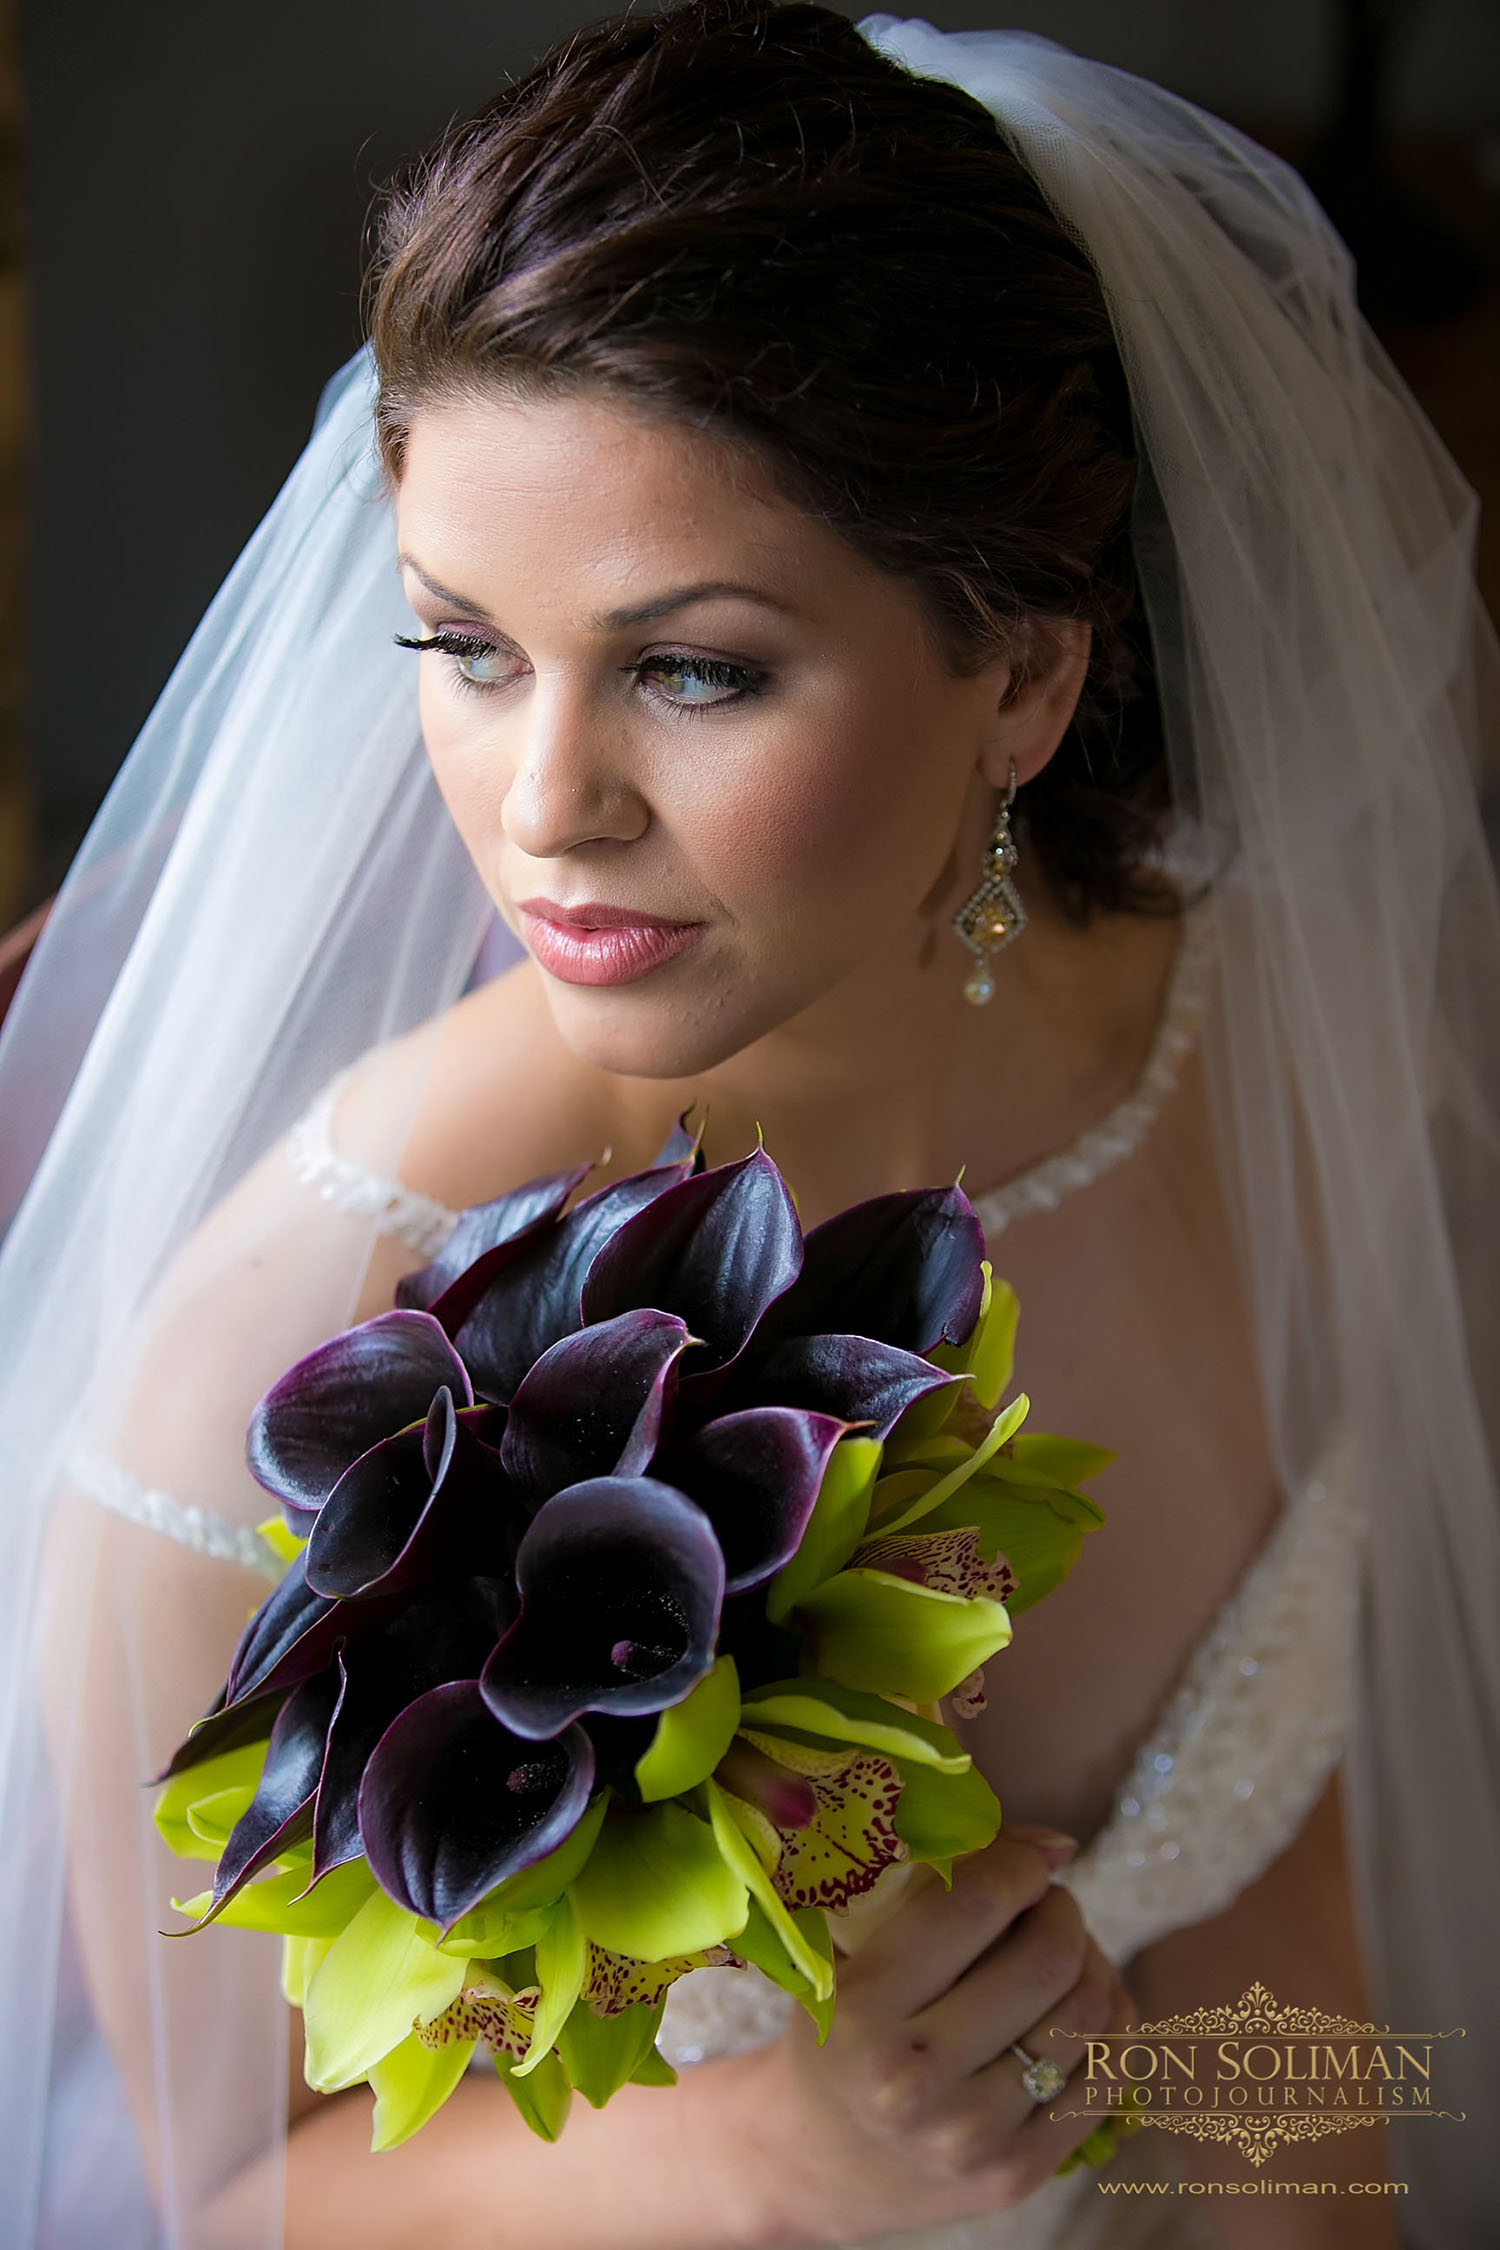 Ron SolimanPhotojournalism  | Wedding Reception | Sweetwater Farm, Glen Mills, PA